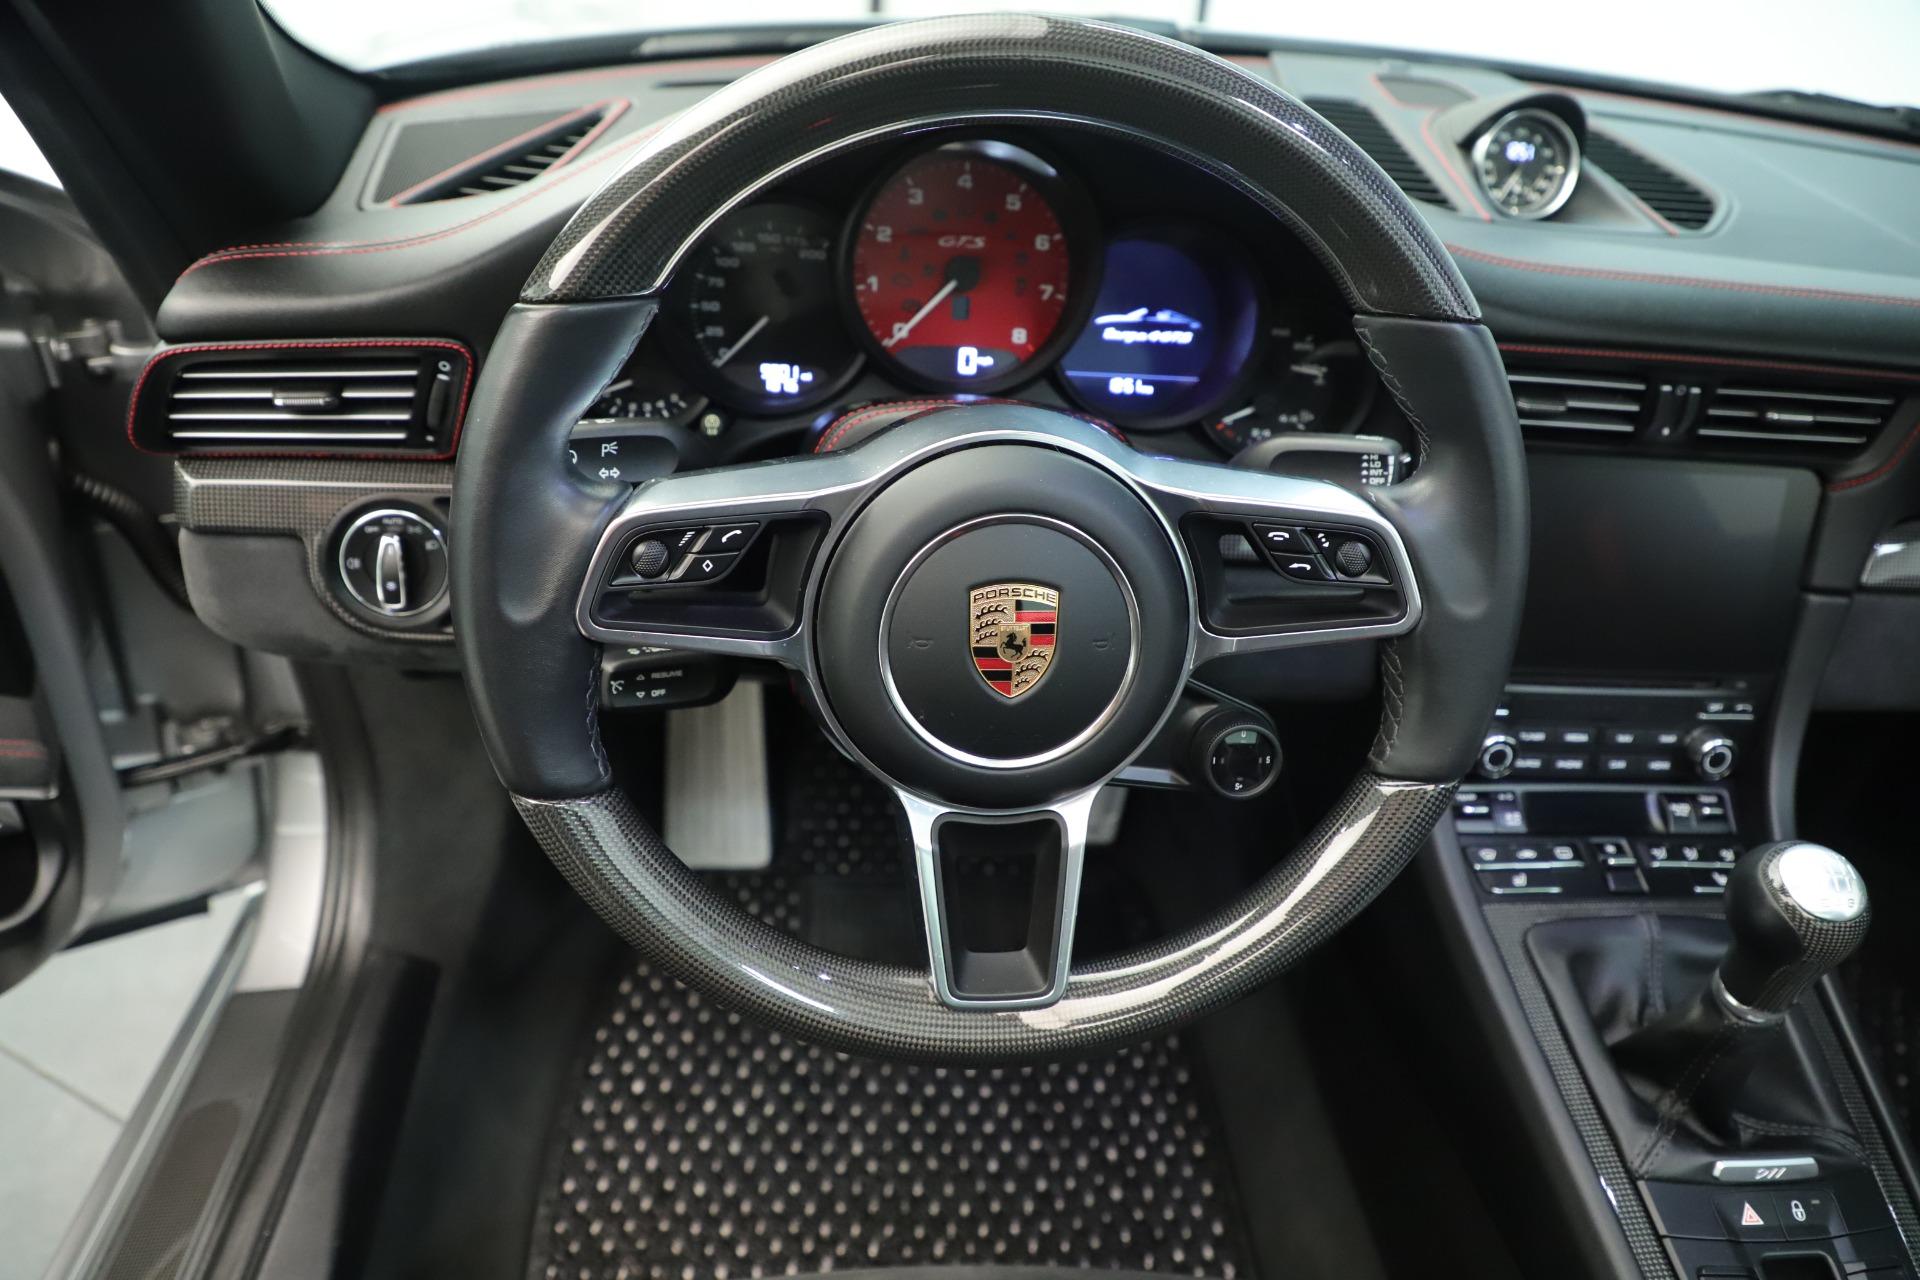 Used 2017 Porsche 911 Targa 4 GTS For Sale In Greenwich, CT 3374_p25